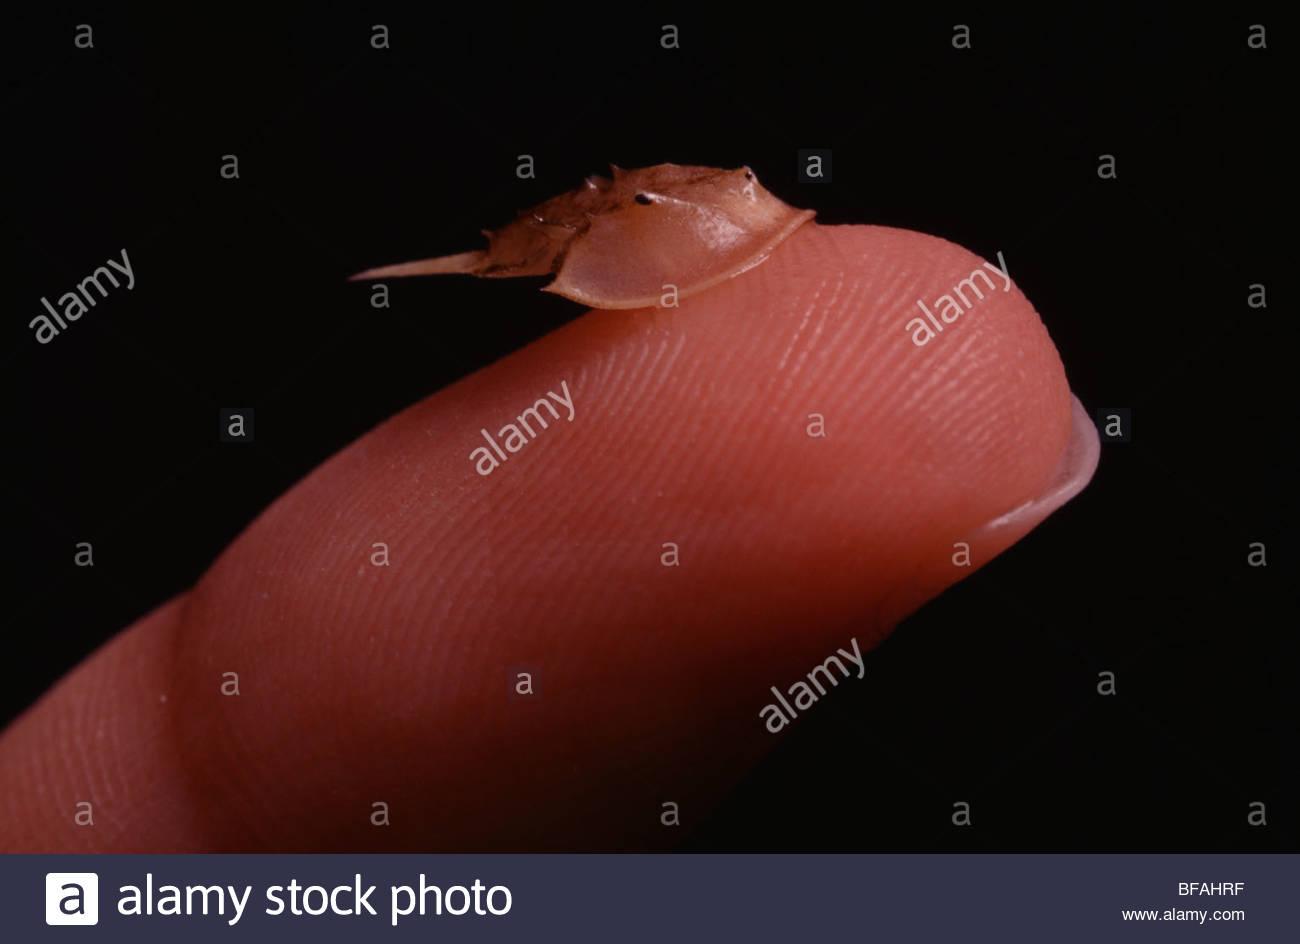 Baby horseshoe crab on finger, Limulus polyphemus, Delaware Bay, New Jersey - Stock Image